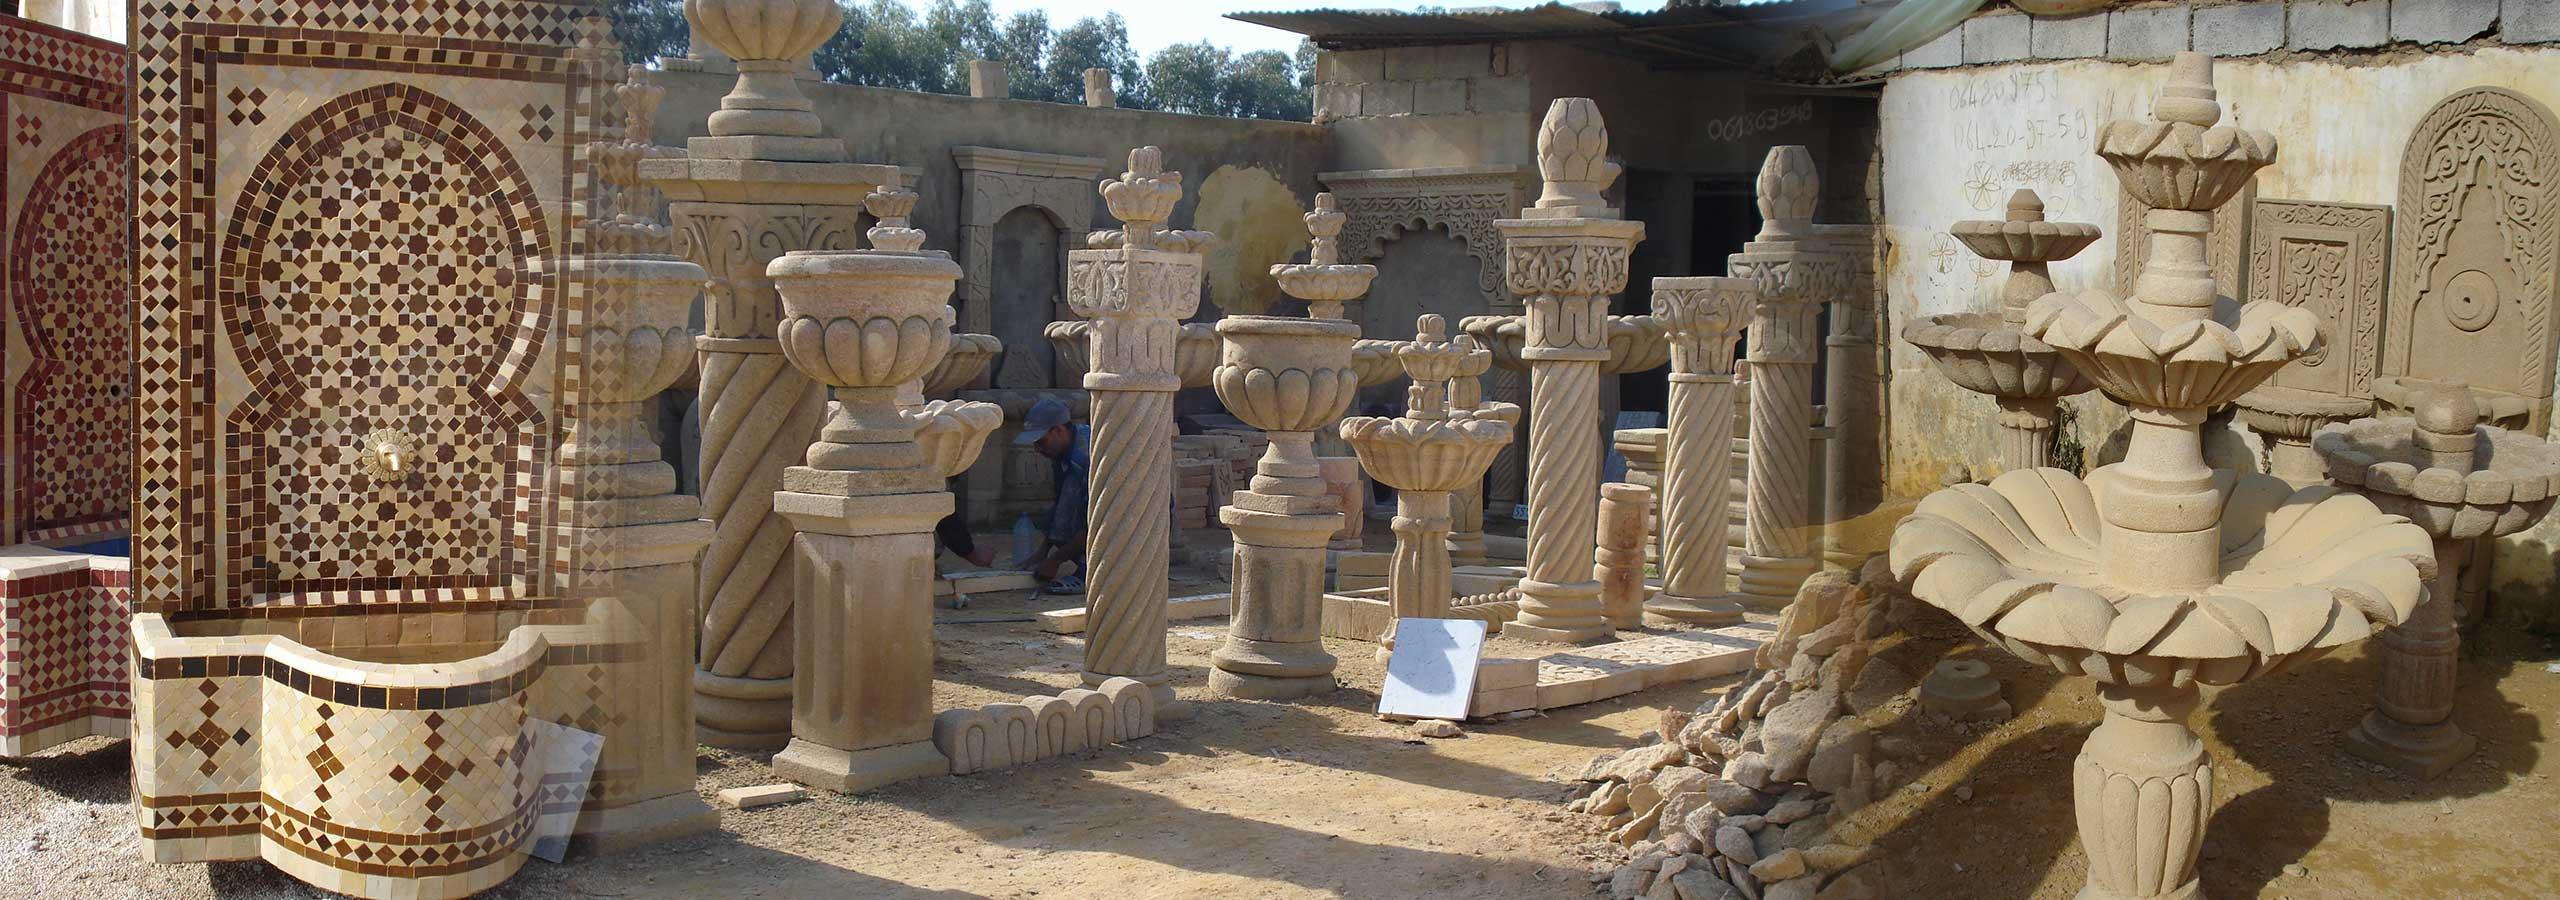 fontane-pietra